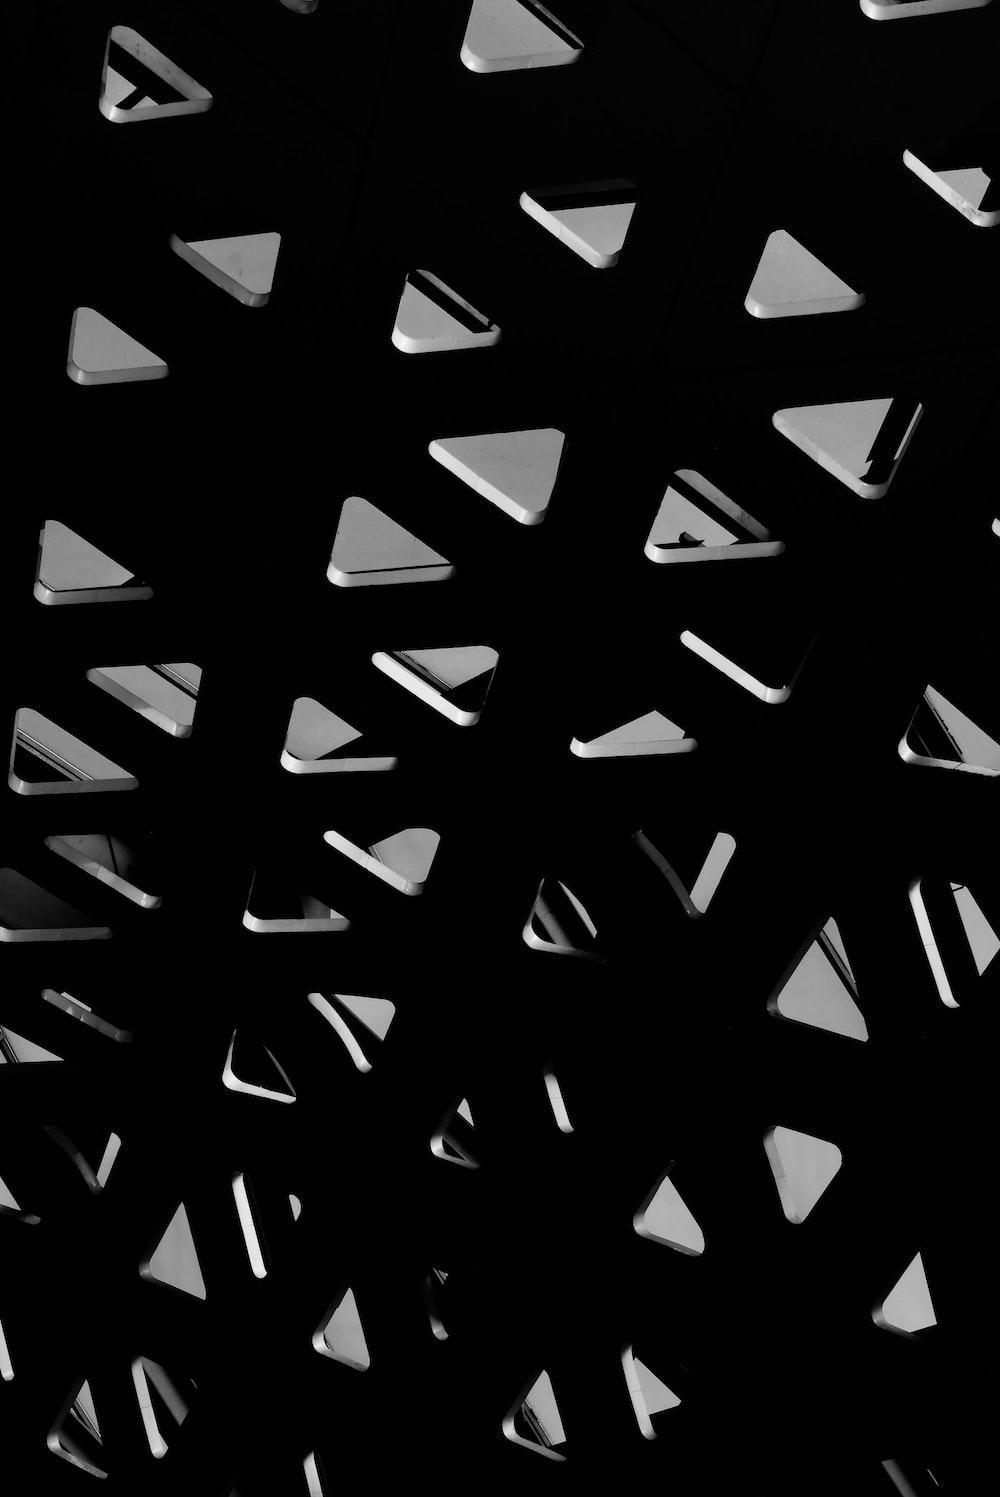 black and white checkered illustration